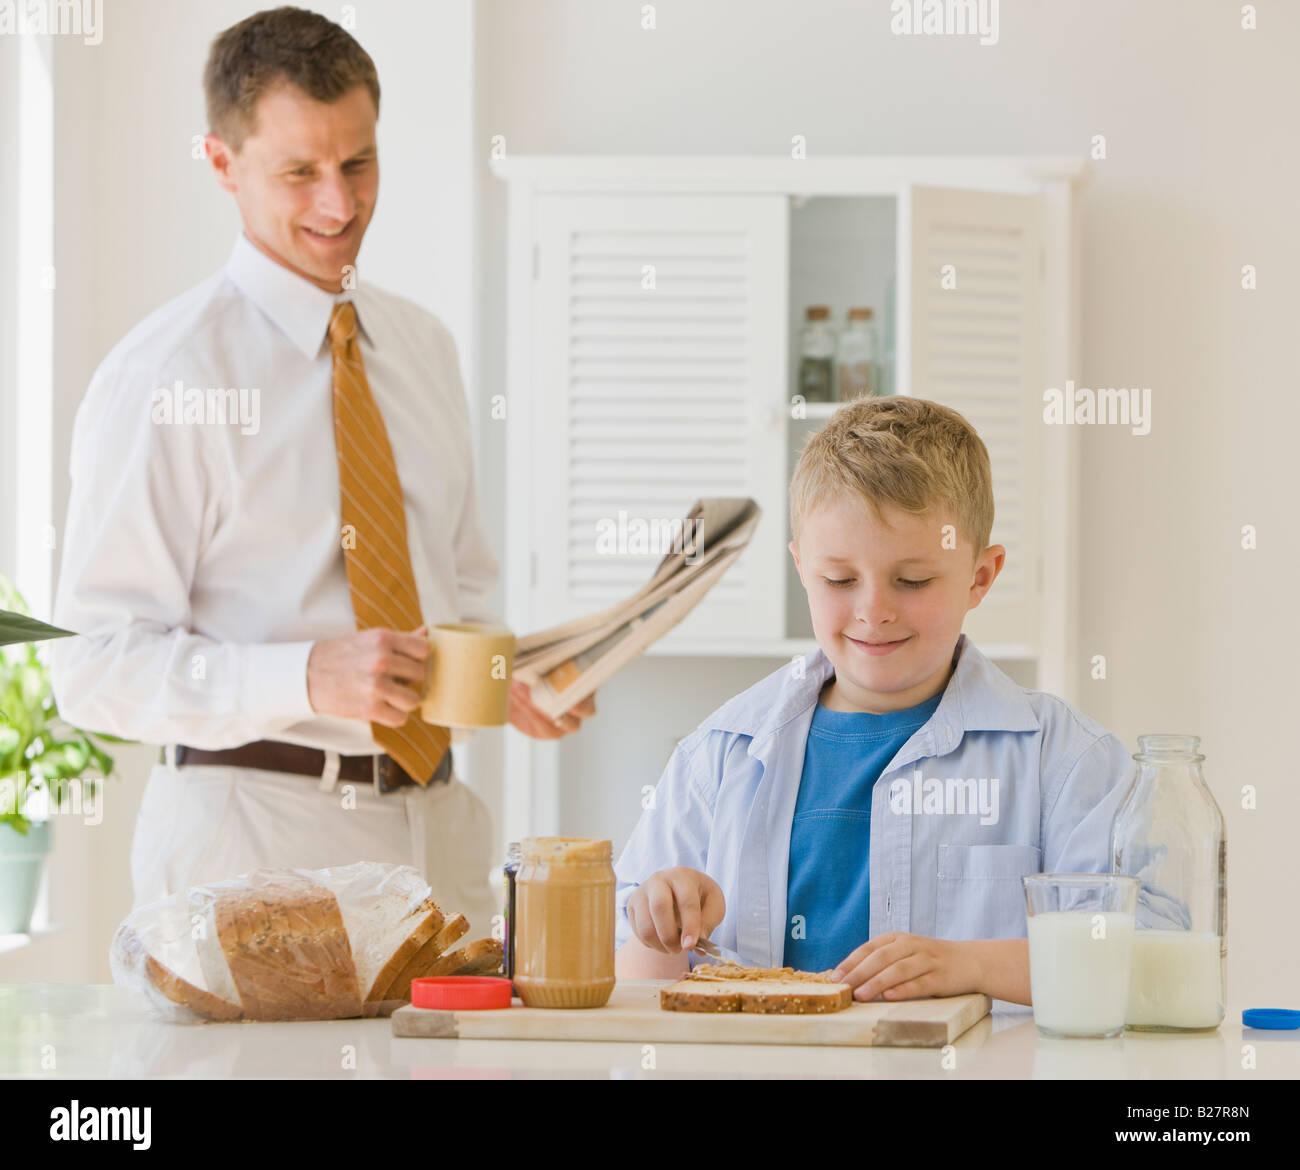 Father watching son make sandwich - Stock Image